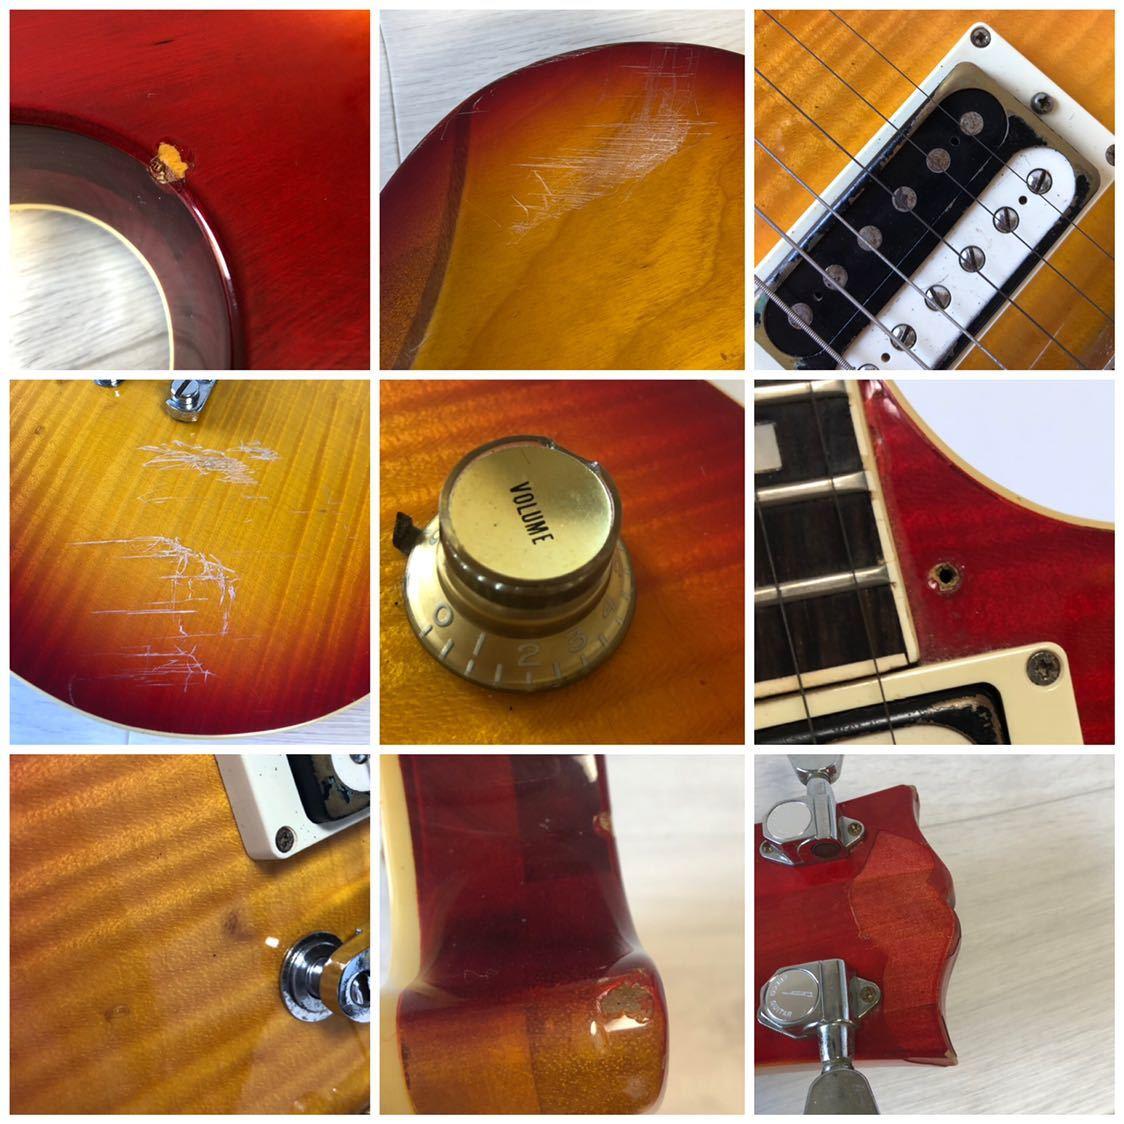 GRECO グレコ 中古 エレキギター 現状品 型番不明 ジャンク_画像10